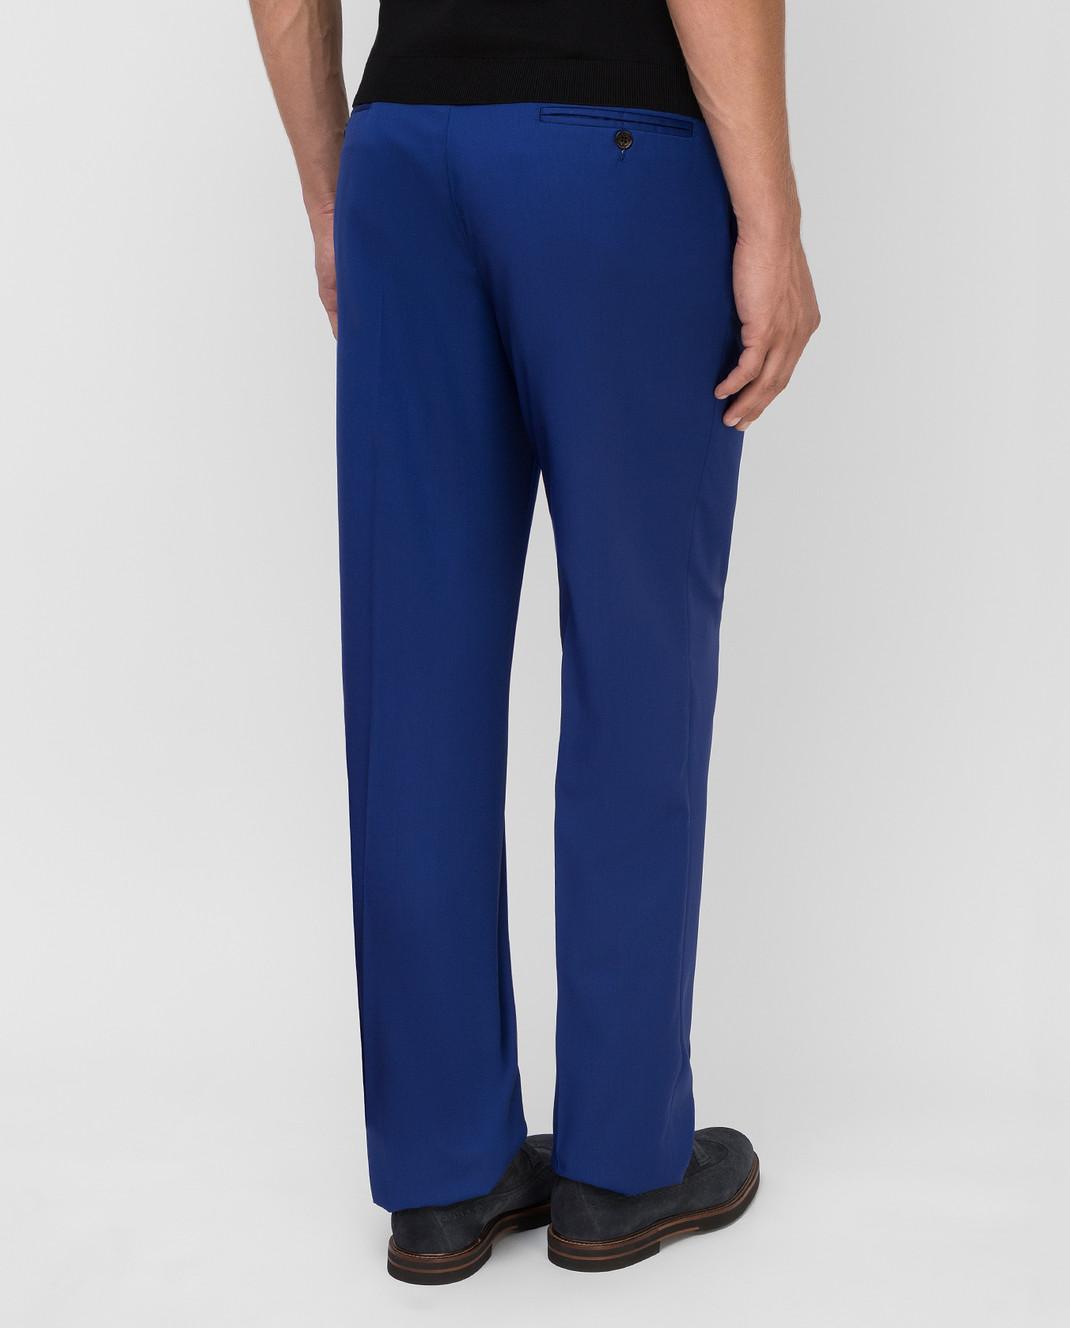 Castello d'Oro Синие брюки из шерсти изображение 4